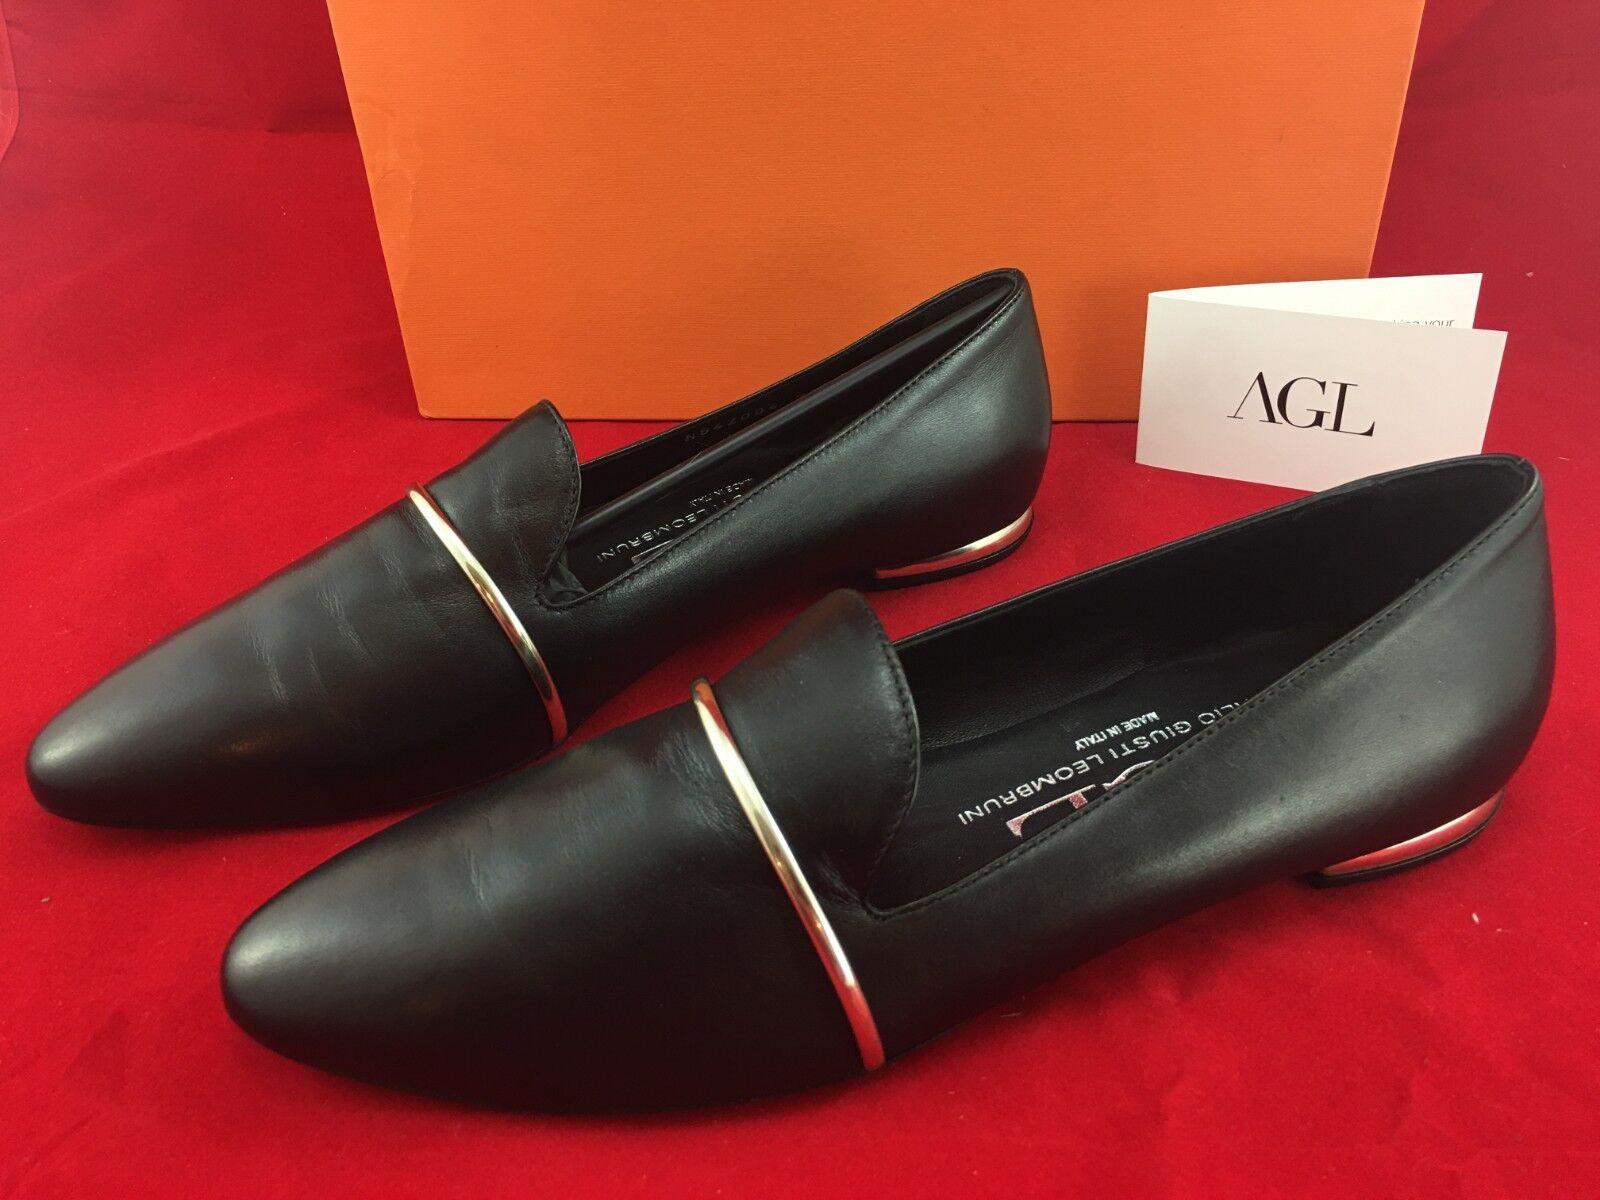 AGL Attilio Giusti Leombruni Smoking Slippers Flats 39 EUR 9 US Black Leather